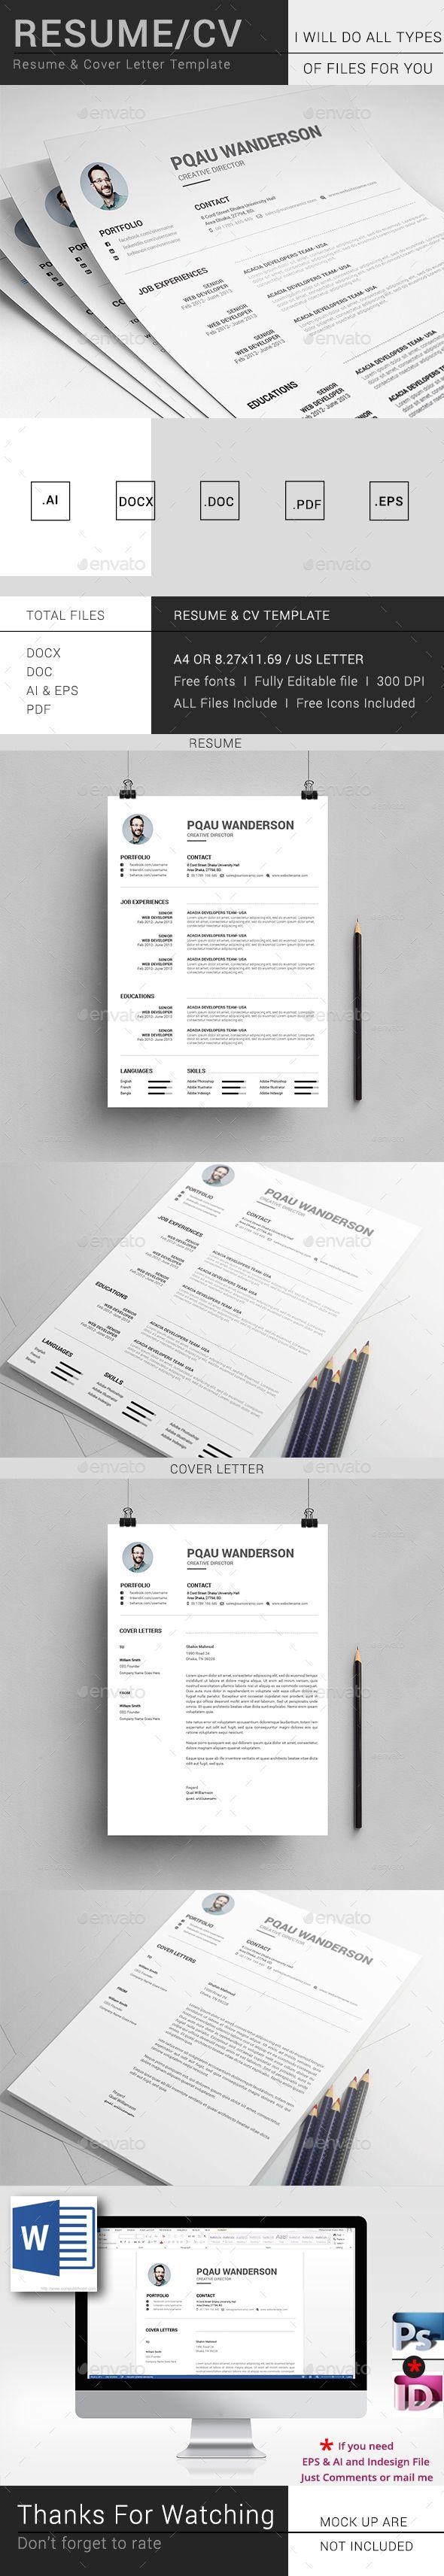 Resume Pdf Download File%0A Clean Resume CV